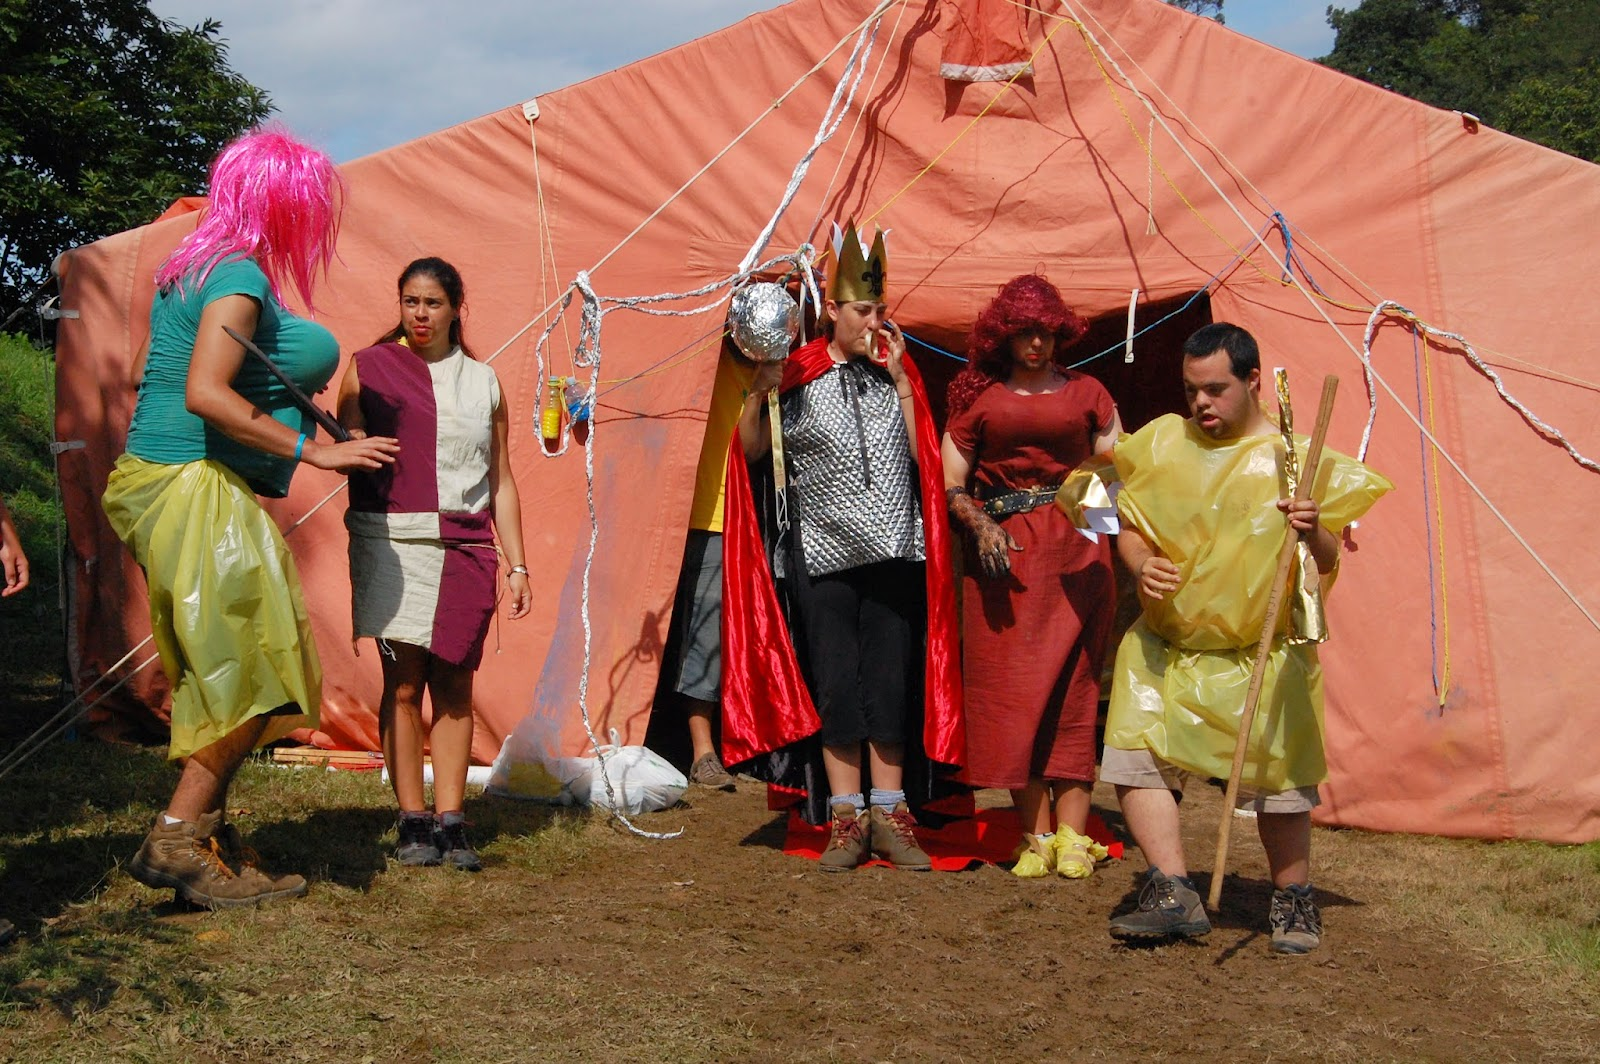 Campaments Estiu RolandKing 2011 - DSC_0188.JPG